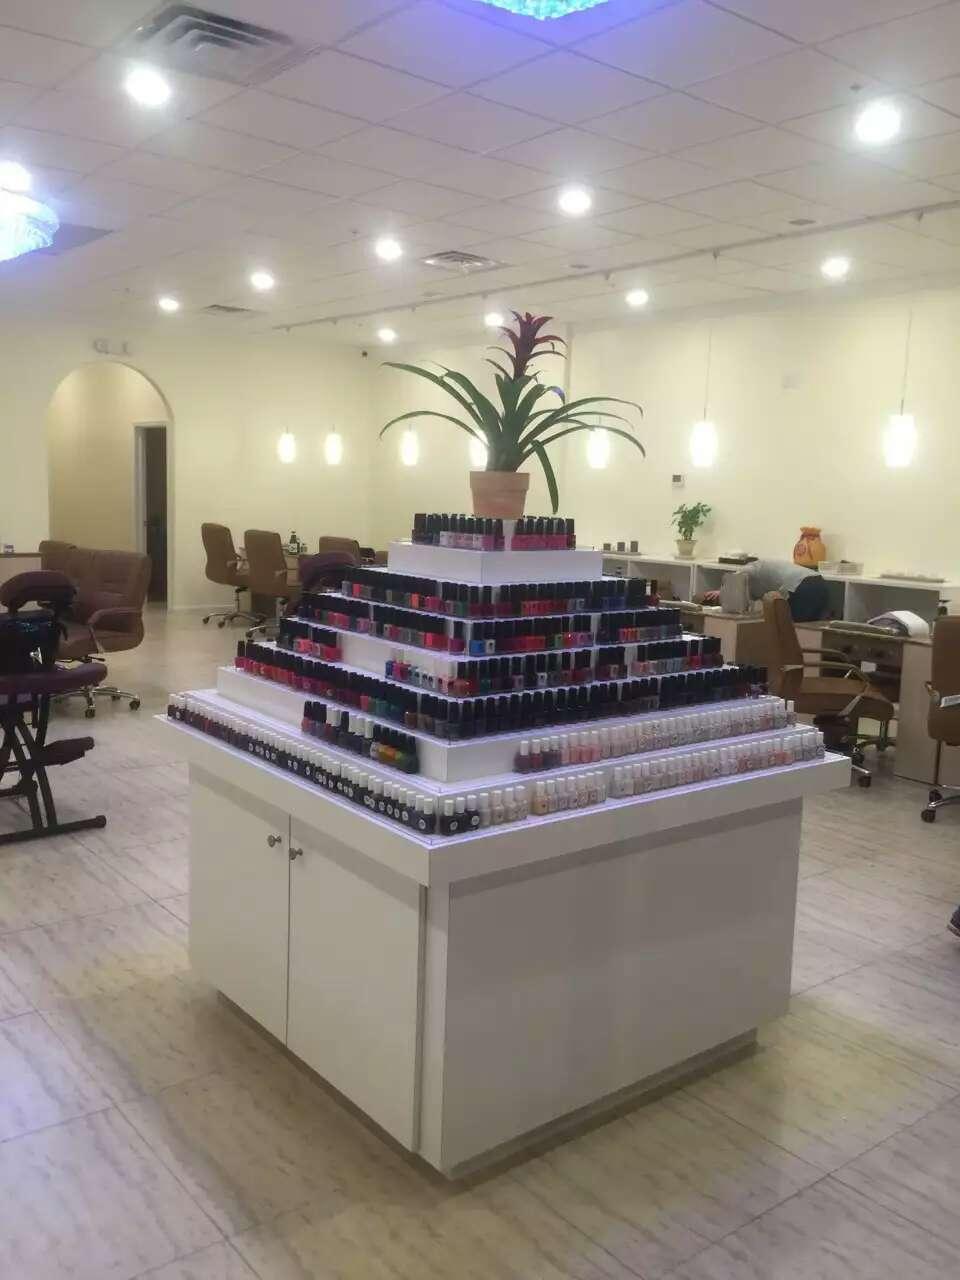 Royal Beauty Nails and Spa - hair care    Photo 5 of 9   Address: 1911, 461 US-46, Fairfield, NJ 07004, USA   Phone: (973) 227-1113